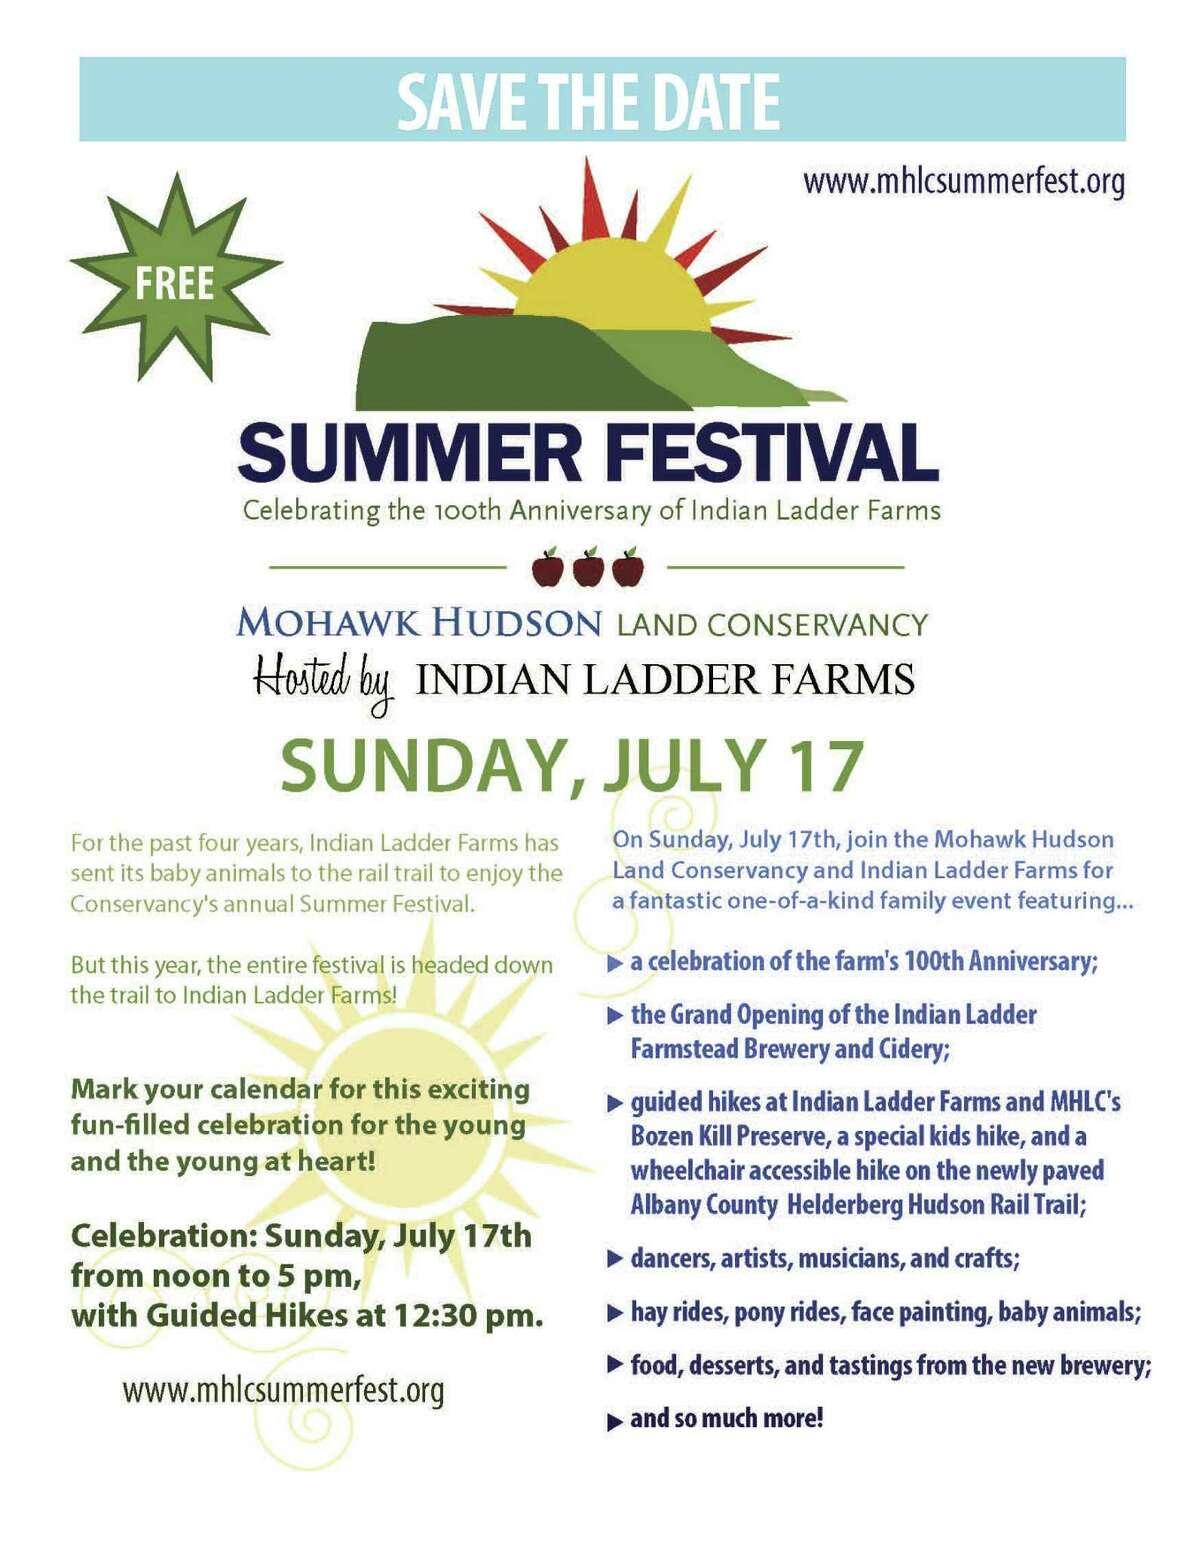 Flyer for Sunday, July 17 Summer Festival at Indian Ladder Farms in Altamont.